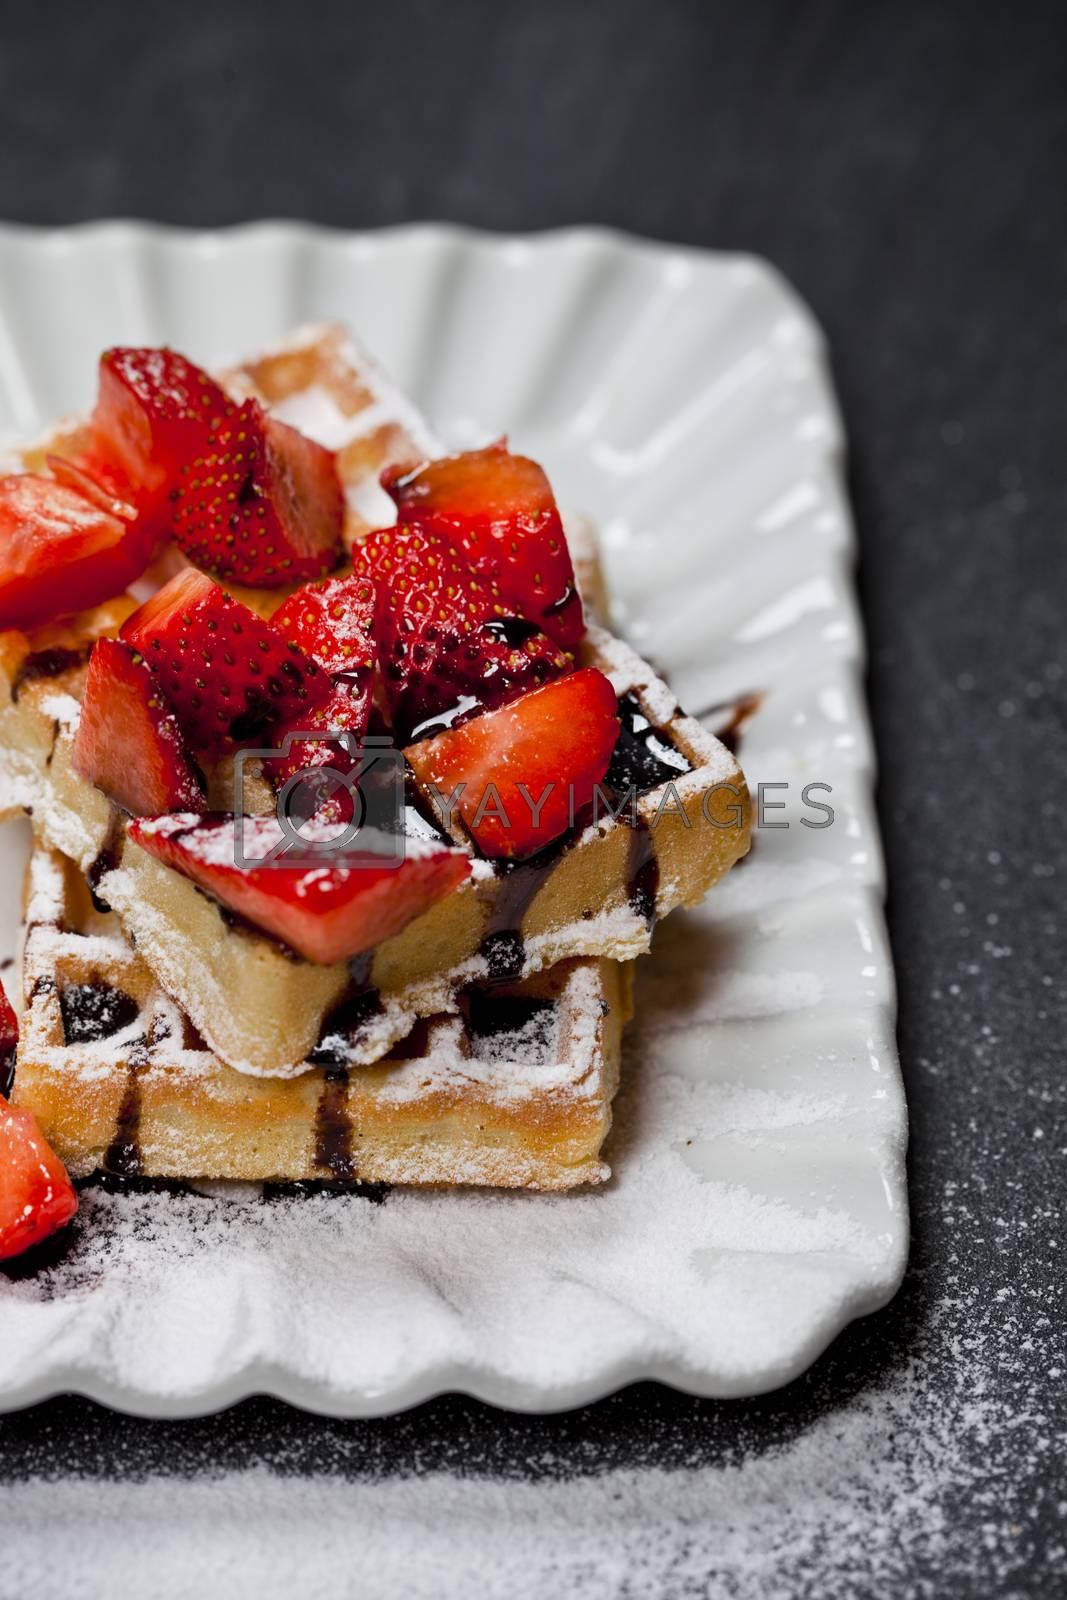 Belgium waffers with sugar powder, strawberries and chocolate on by marylooo